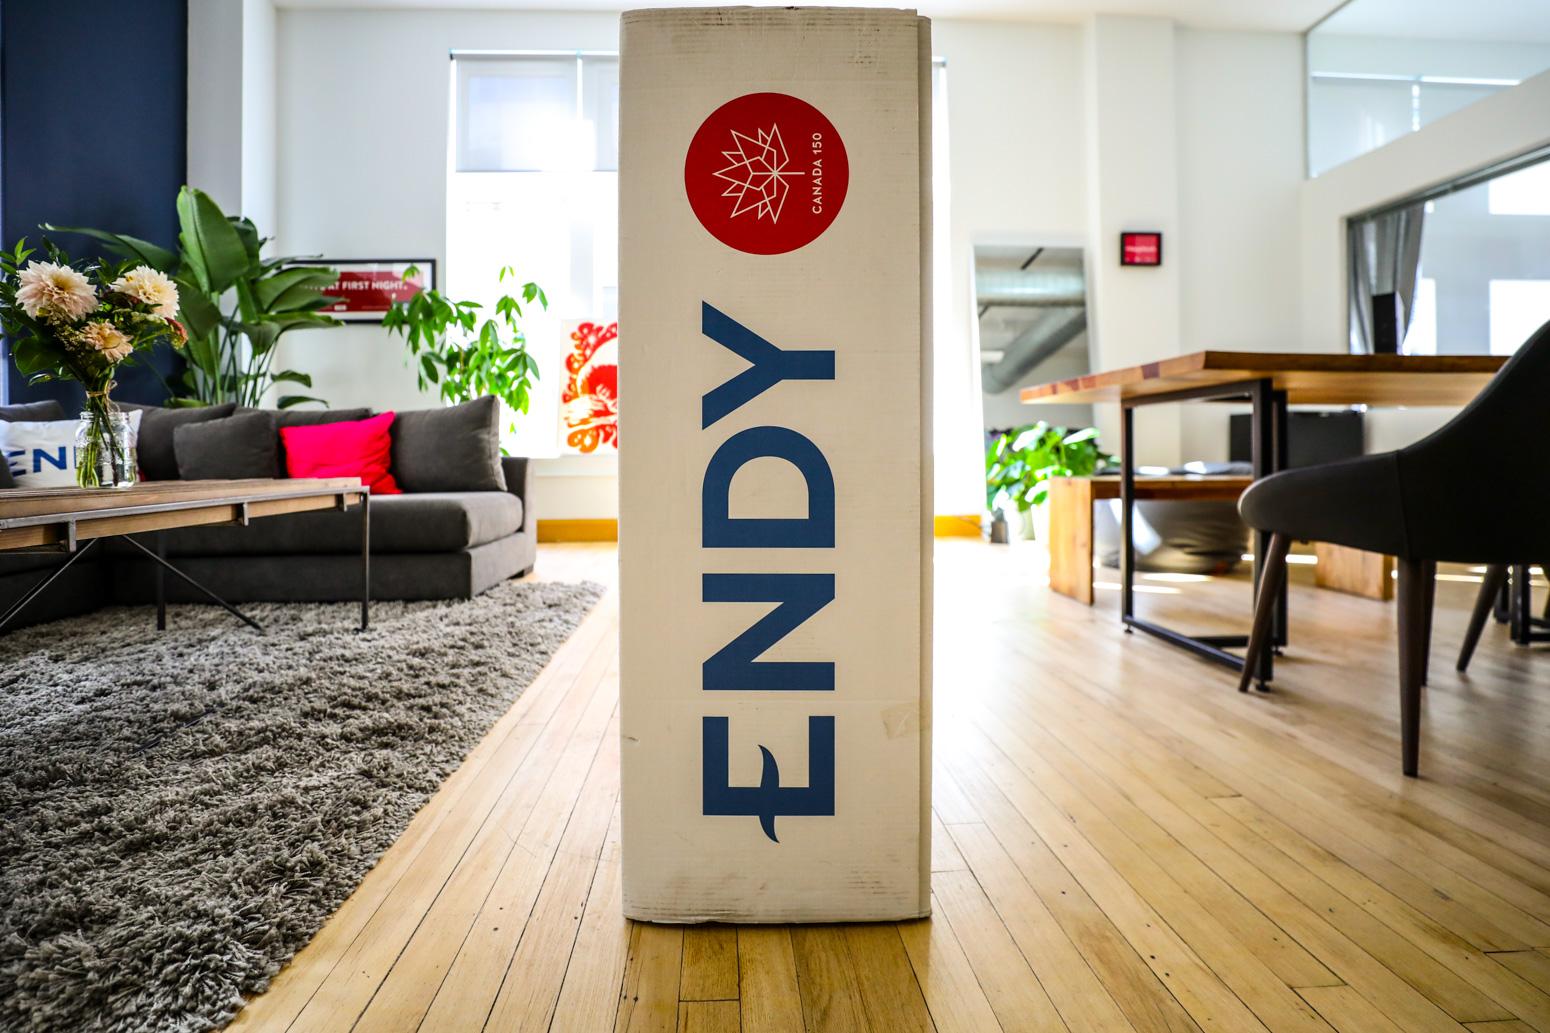 Endy Sleep Office Techvibes-9